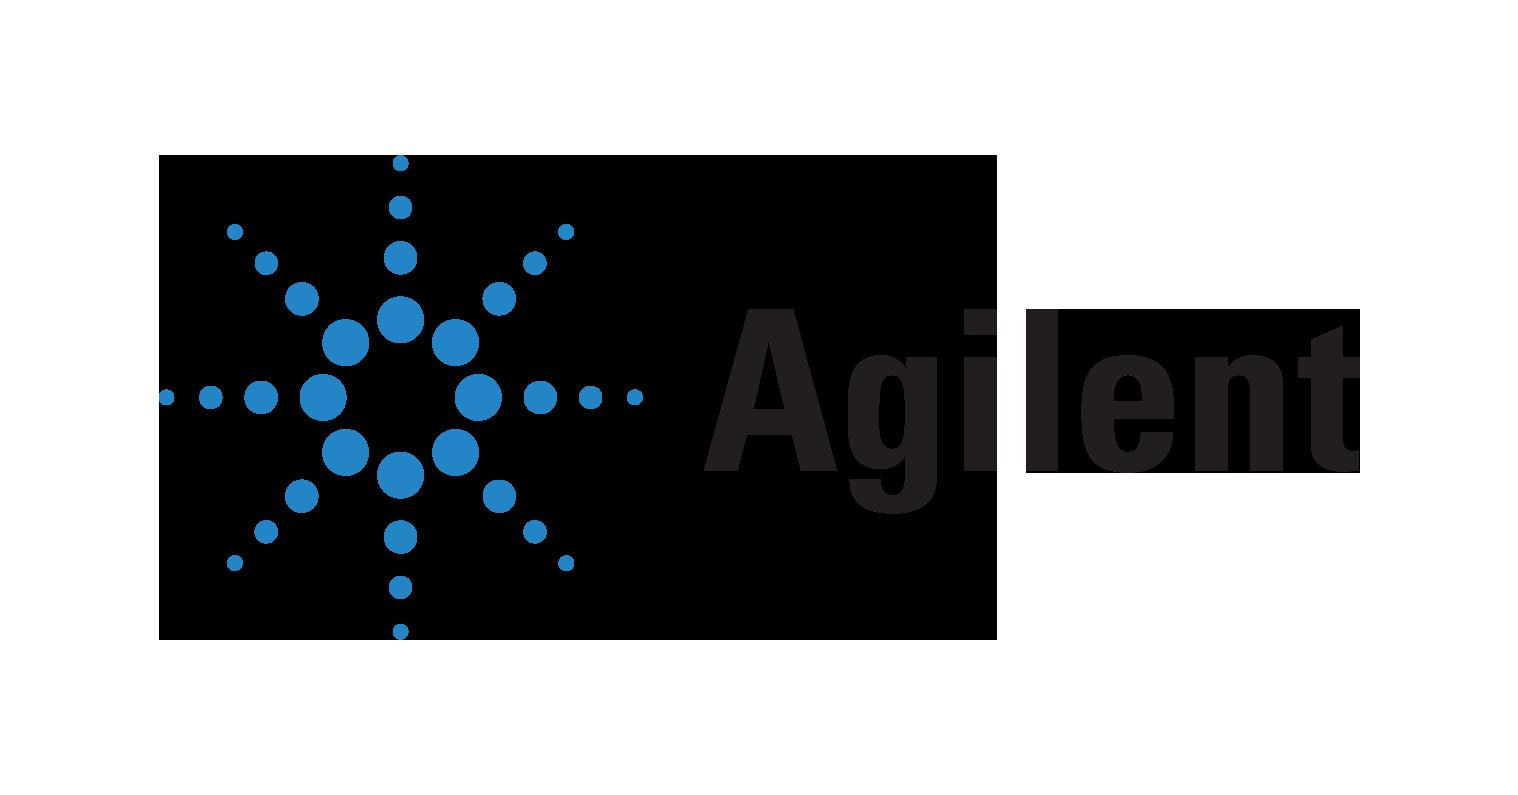 Agilent-Short-CorpSig-RGB.png